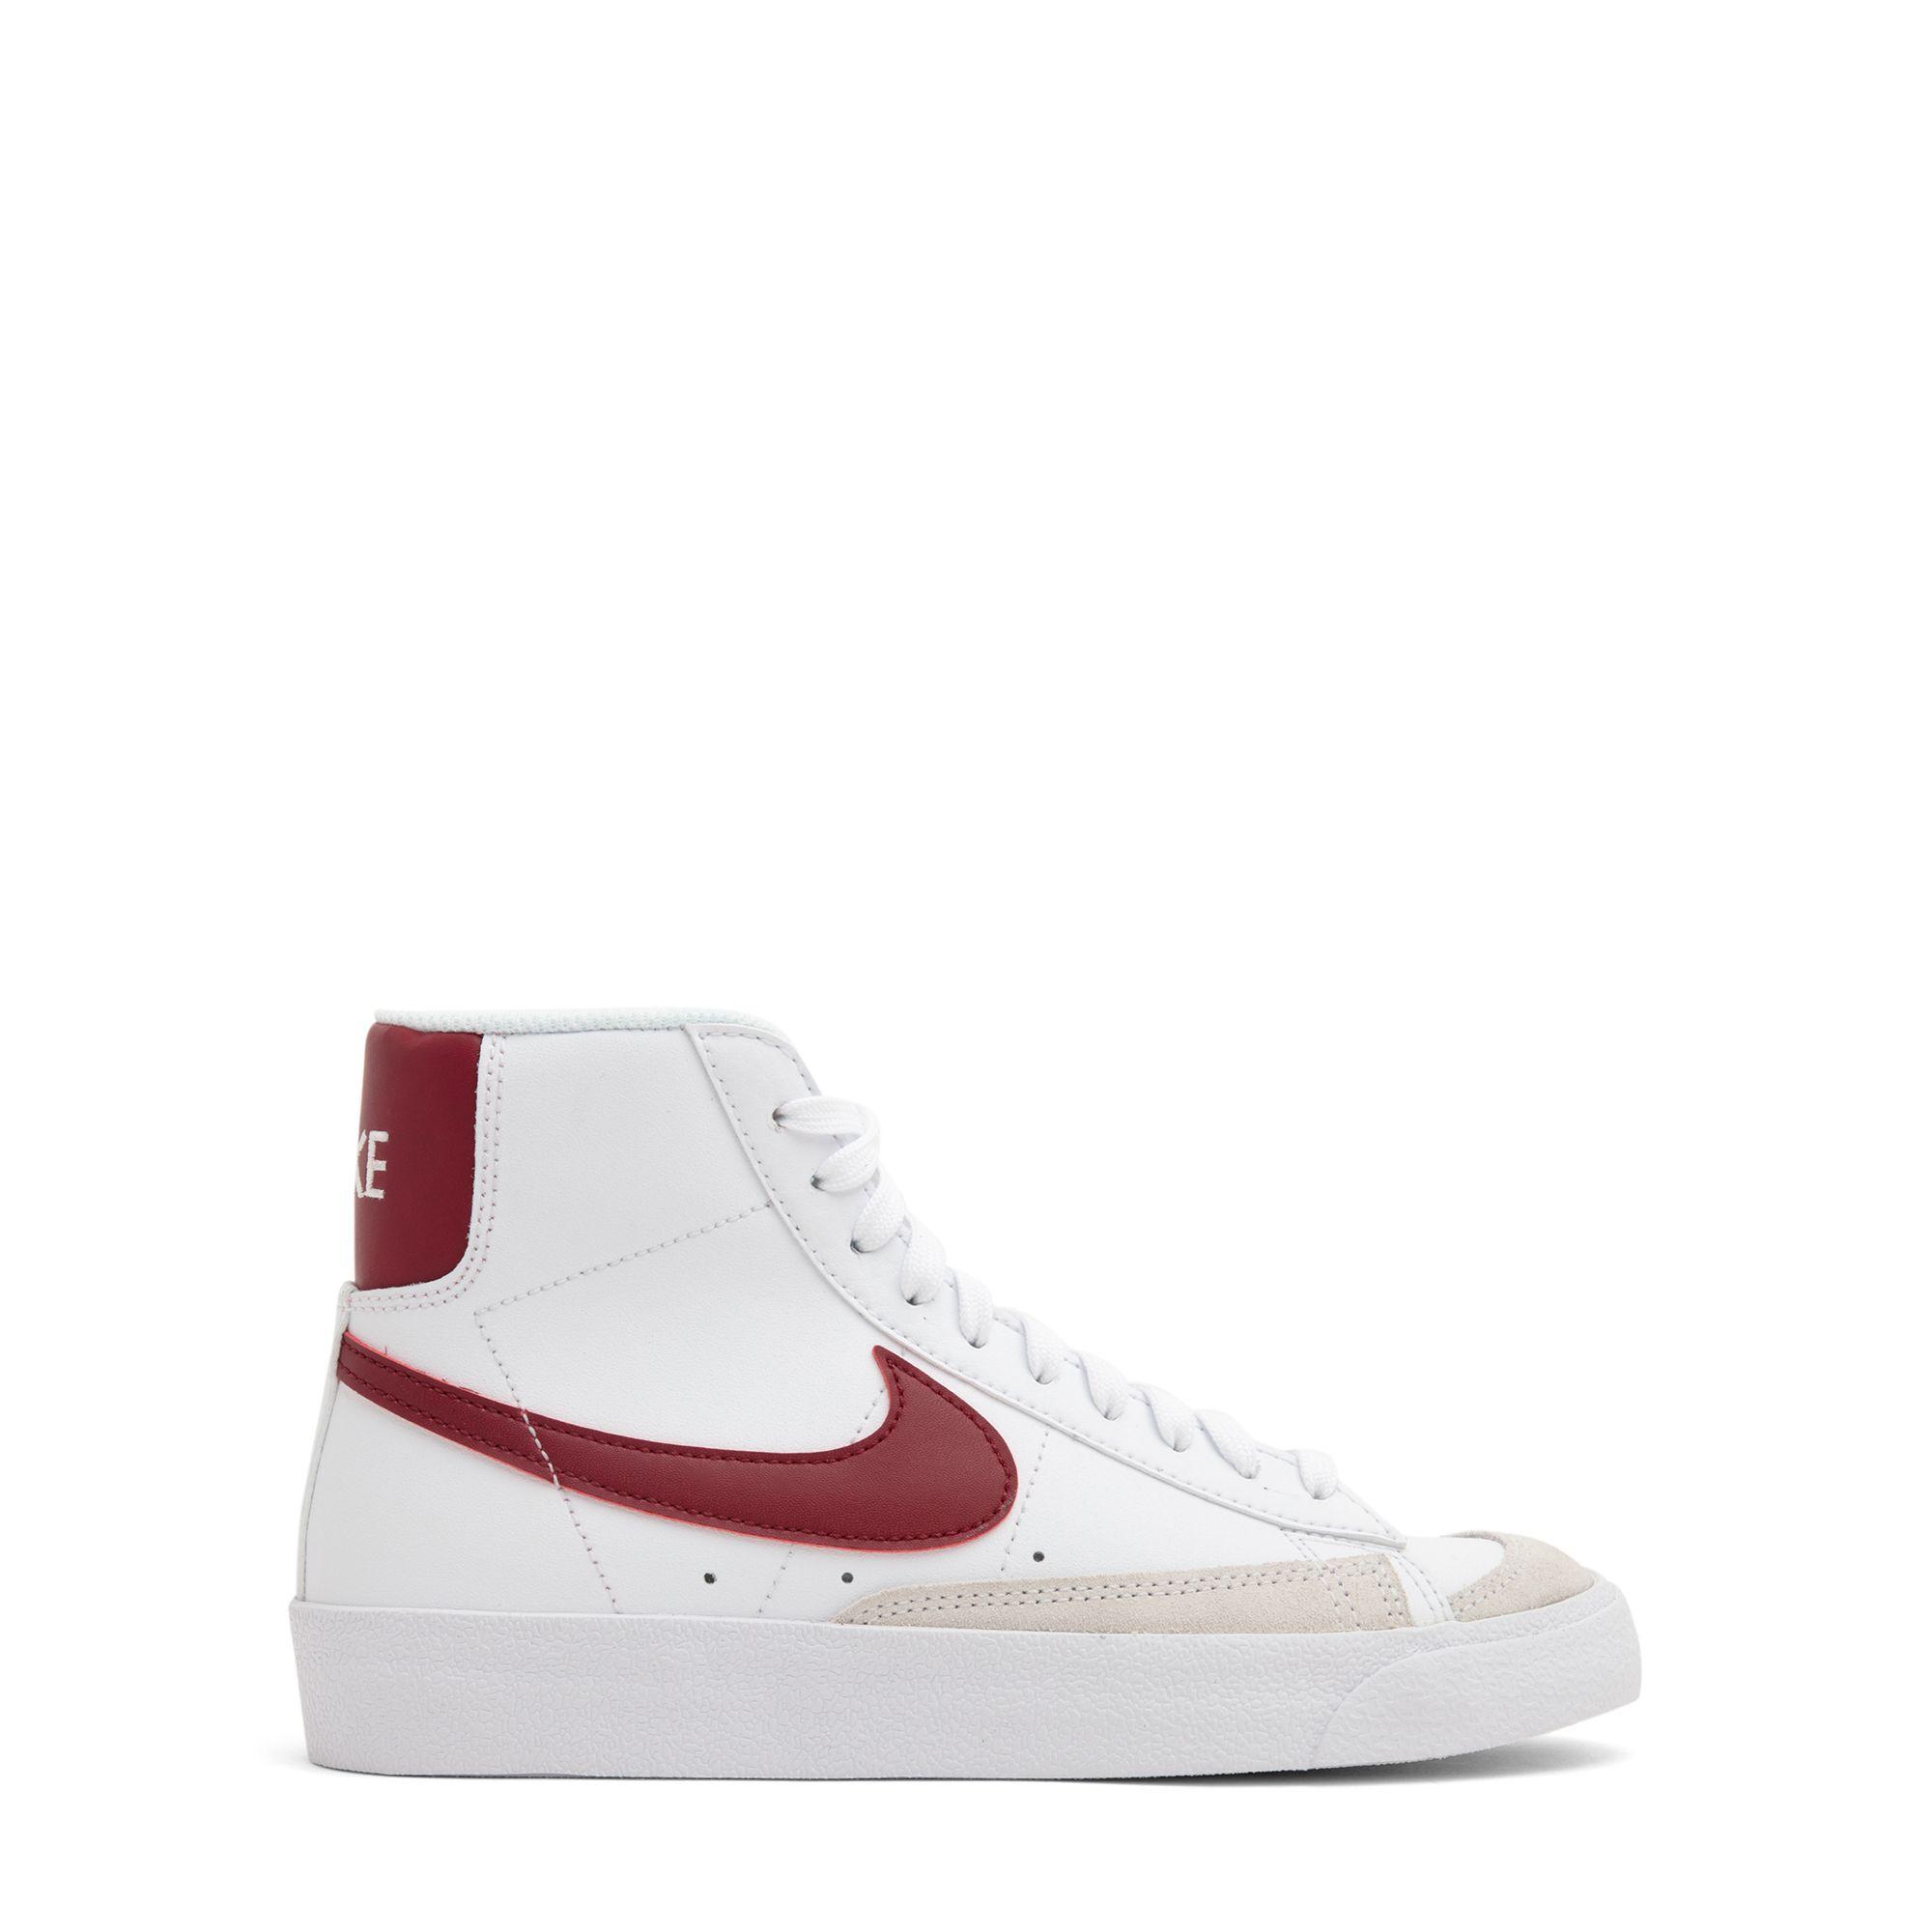 Blazer Mid 77 sneakers